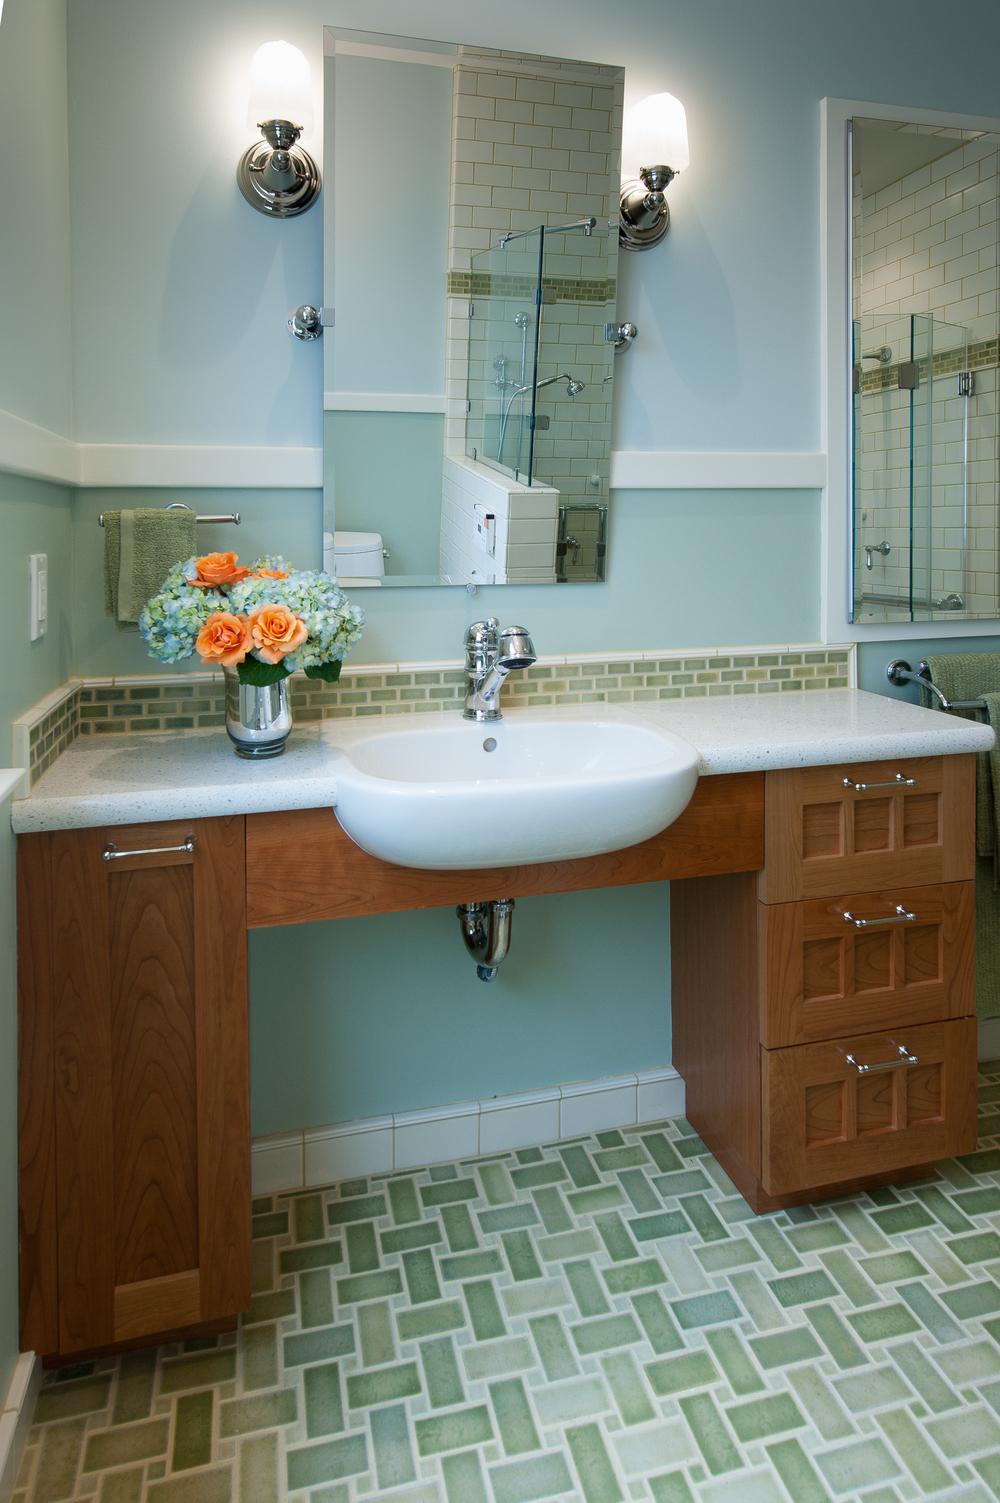 Stunning Design Wheelchair Accessible Bathroom Vanity 7